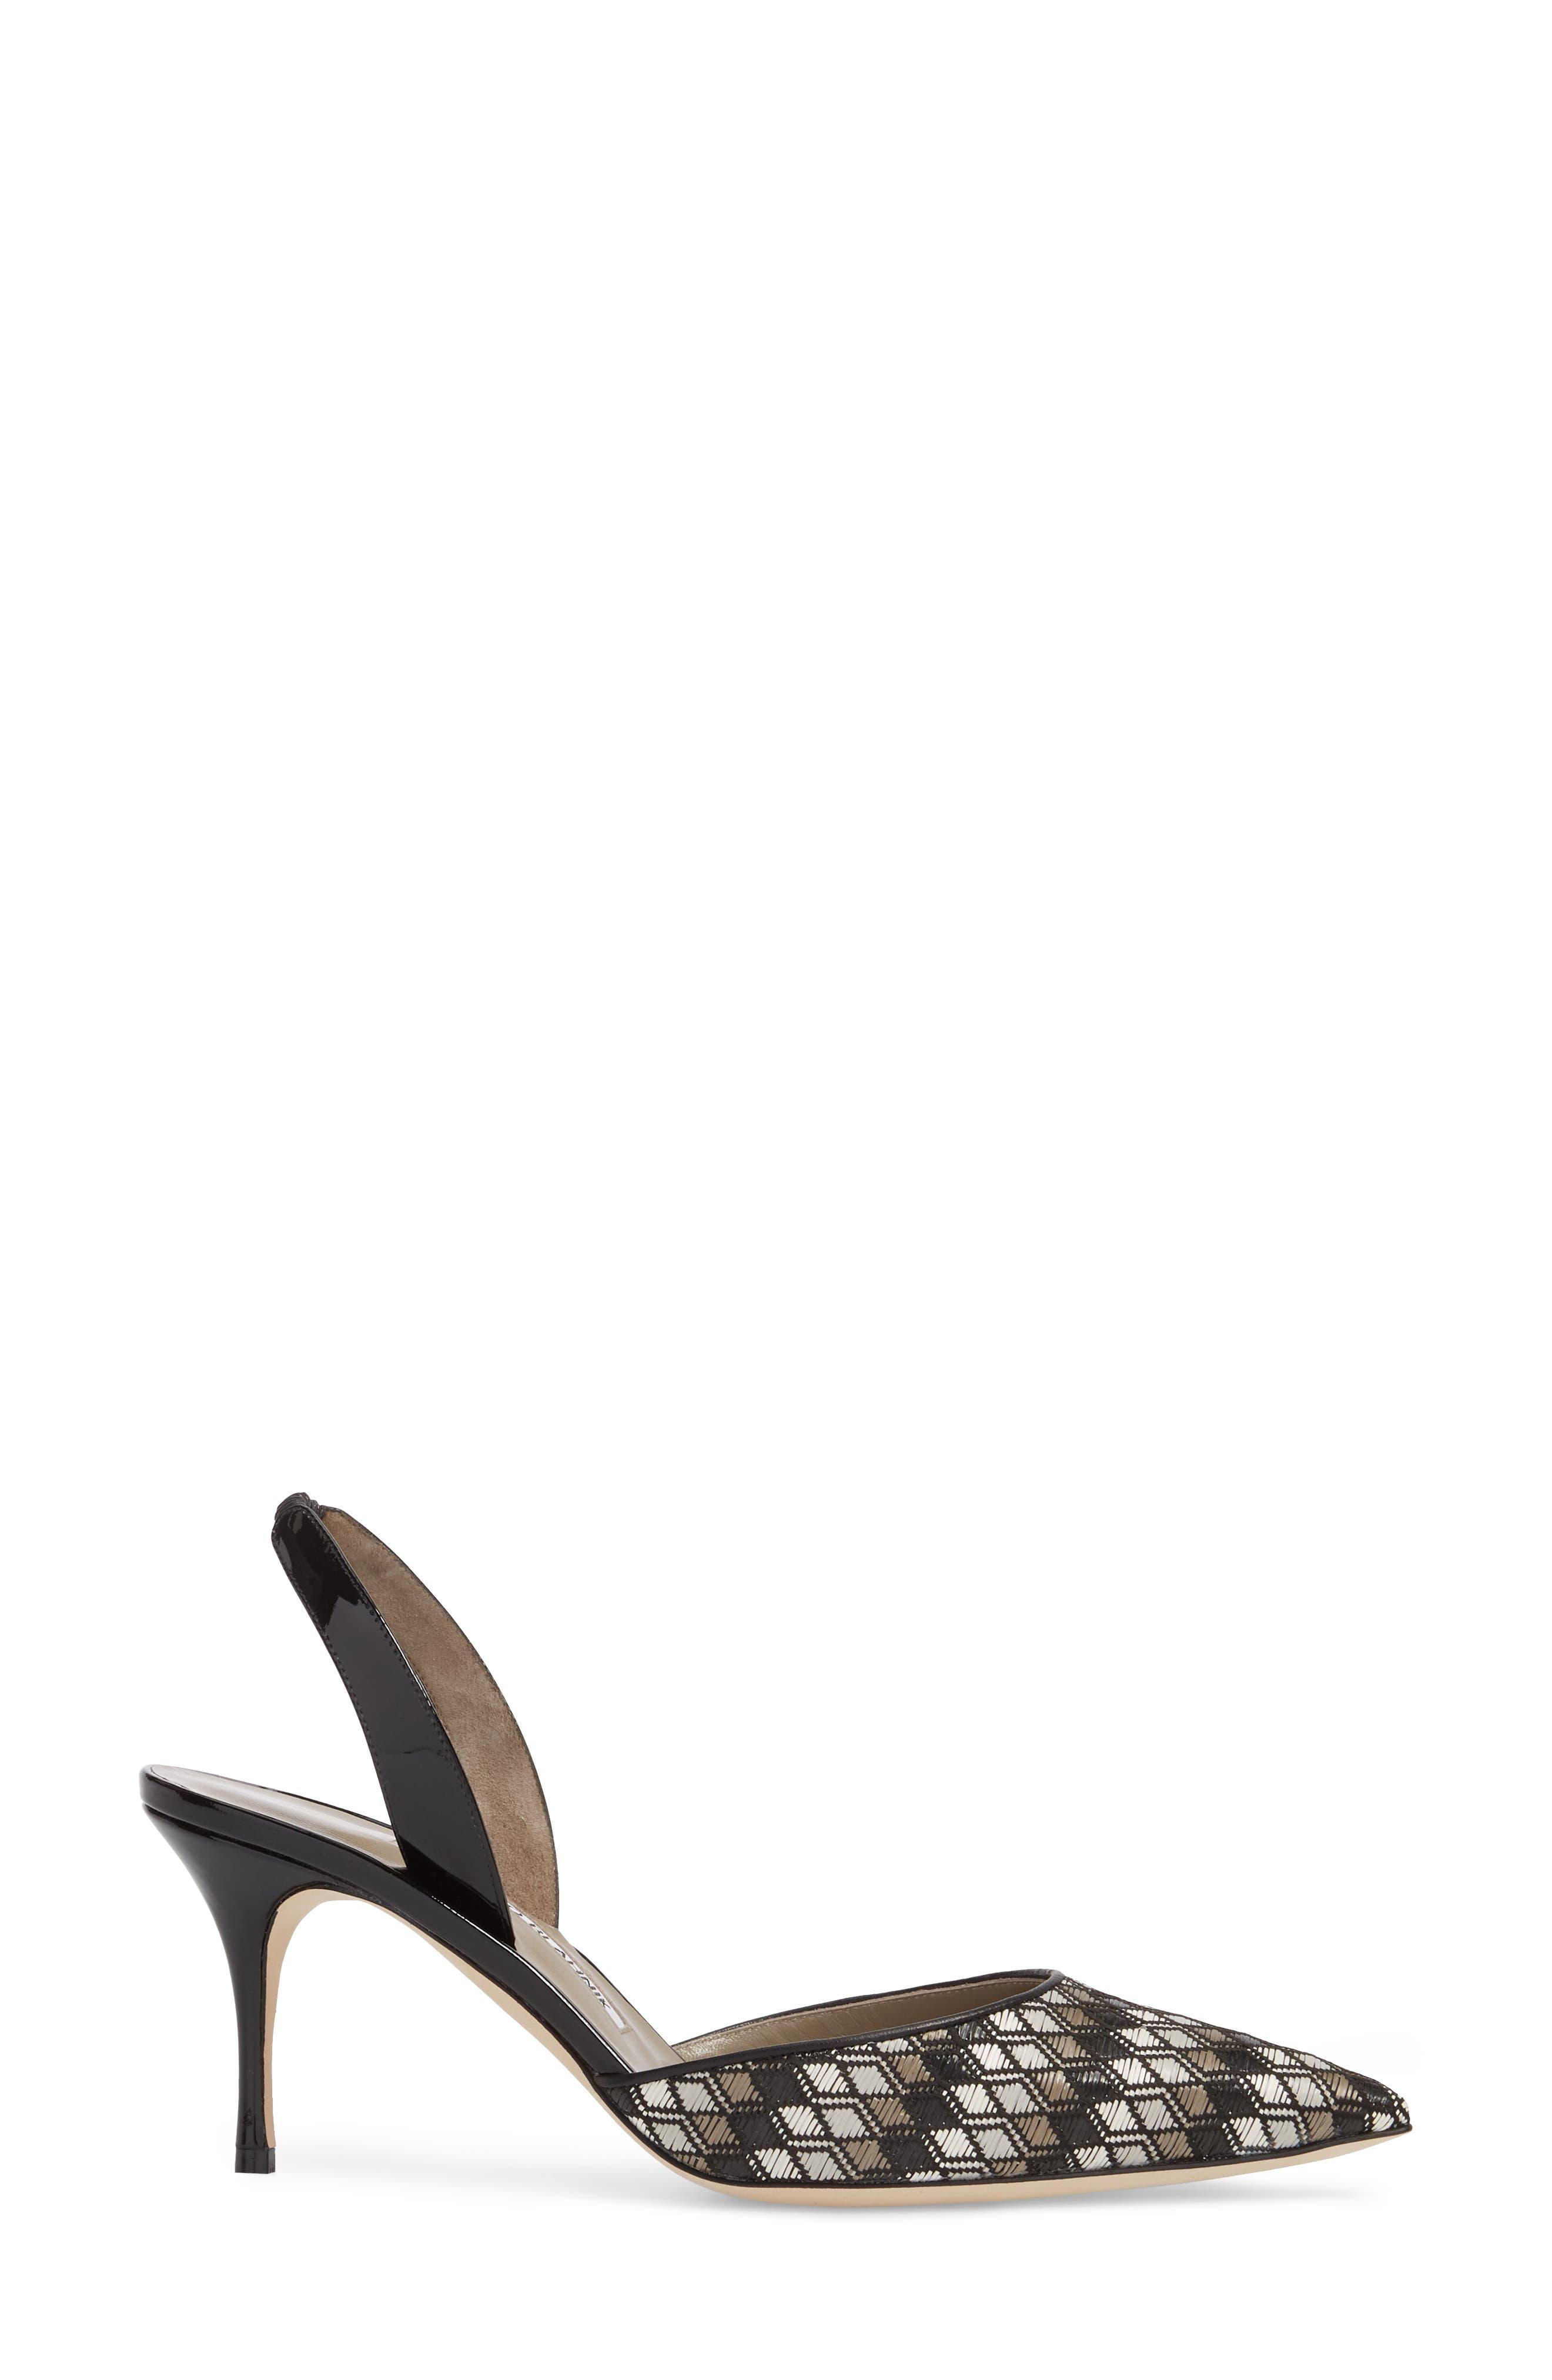 'Carolyne' Pointy Toe Slingback Pump,                             Alternate thumbnail 3, color,                             BLACK/ GREY/ WHITE